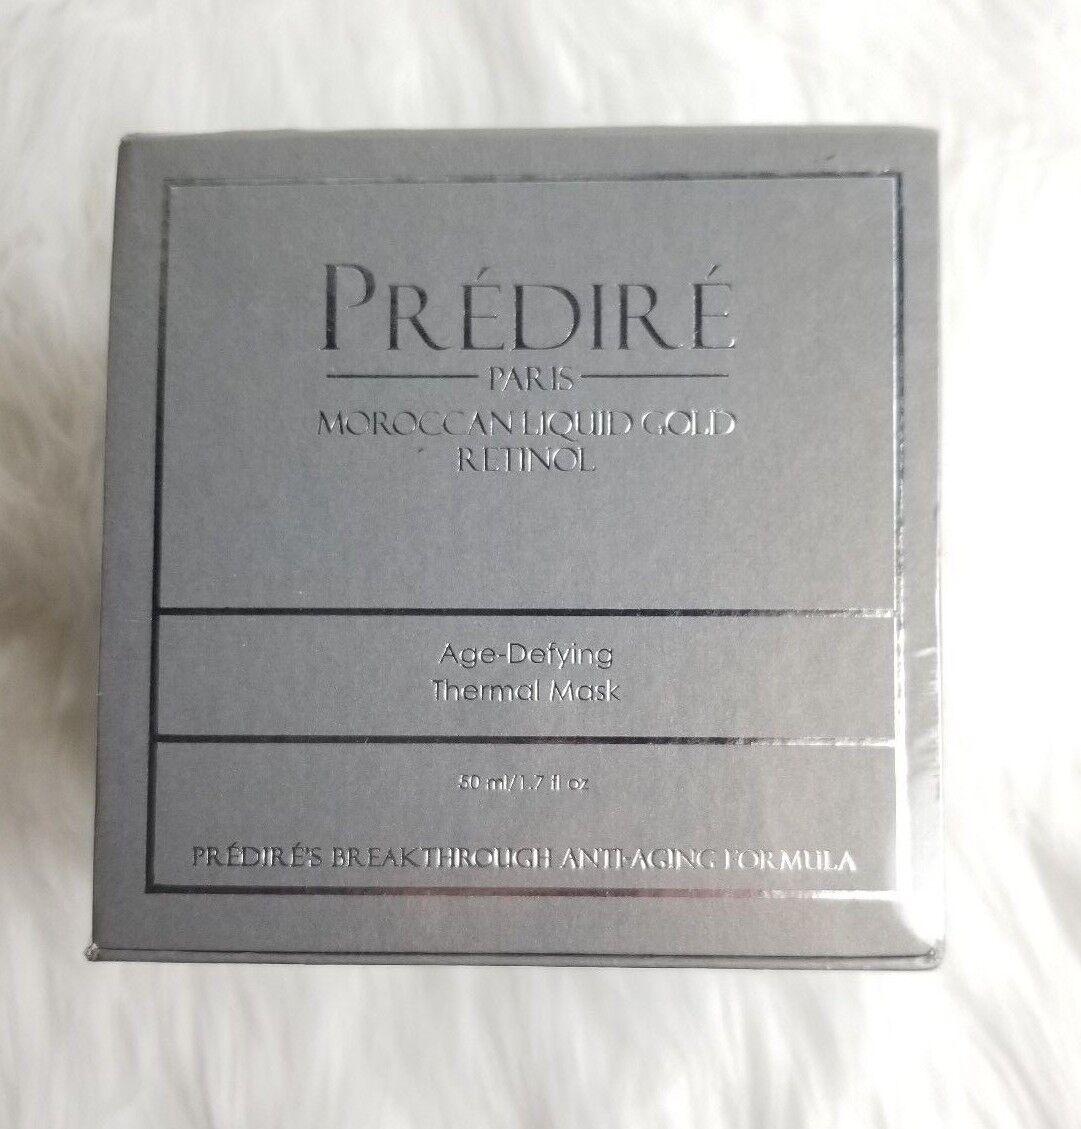 Predire Moroccan Liquid Gold Retinol Age Defying Thermal Mask 50 Ml/1.7 Fl Oz  - $55.99